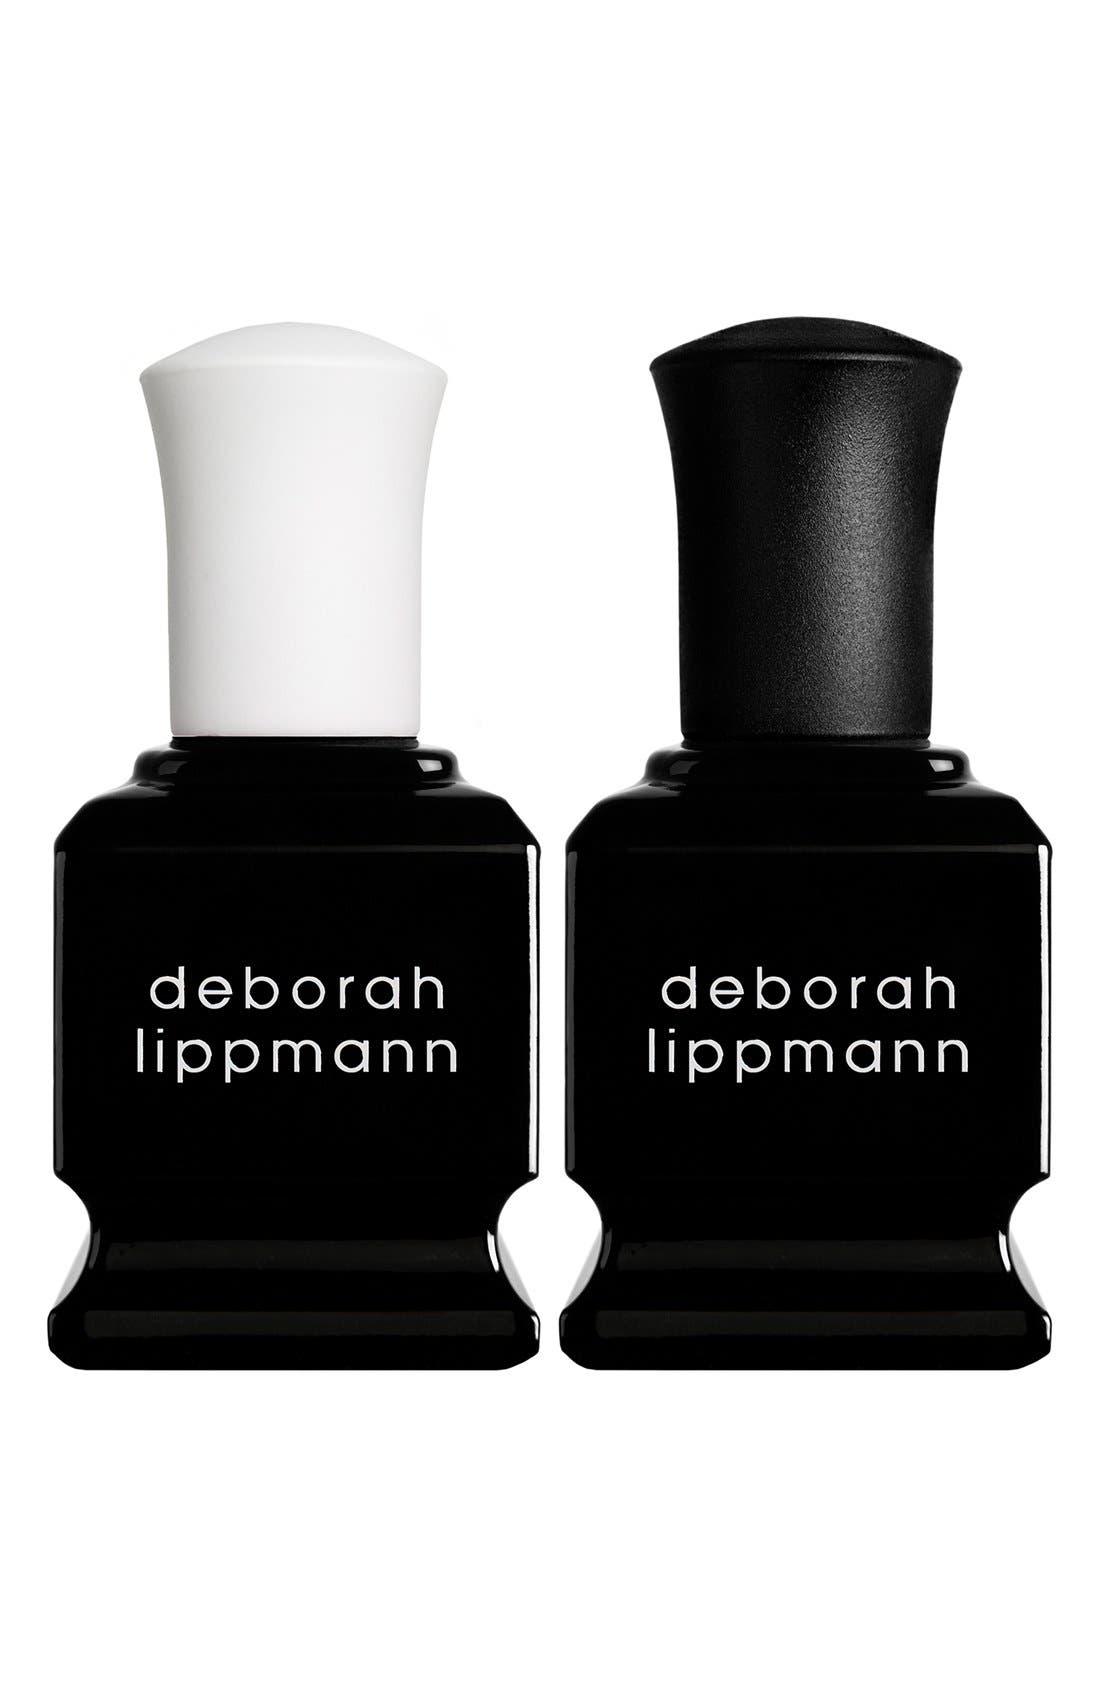 deborah lippmann makeup beauty fragrance and personal care